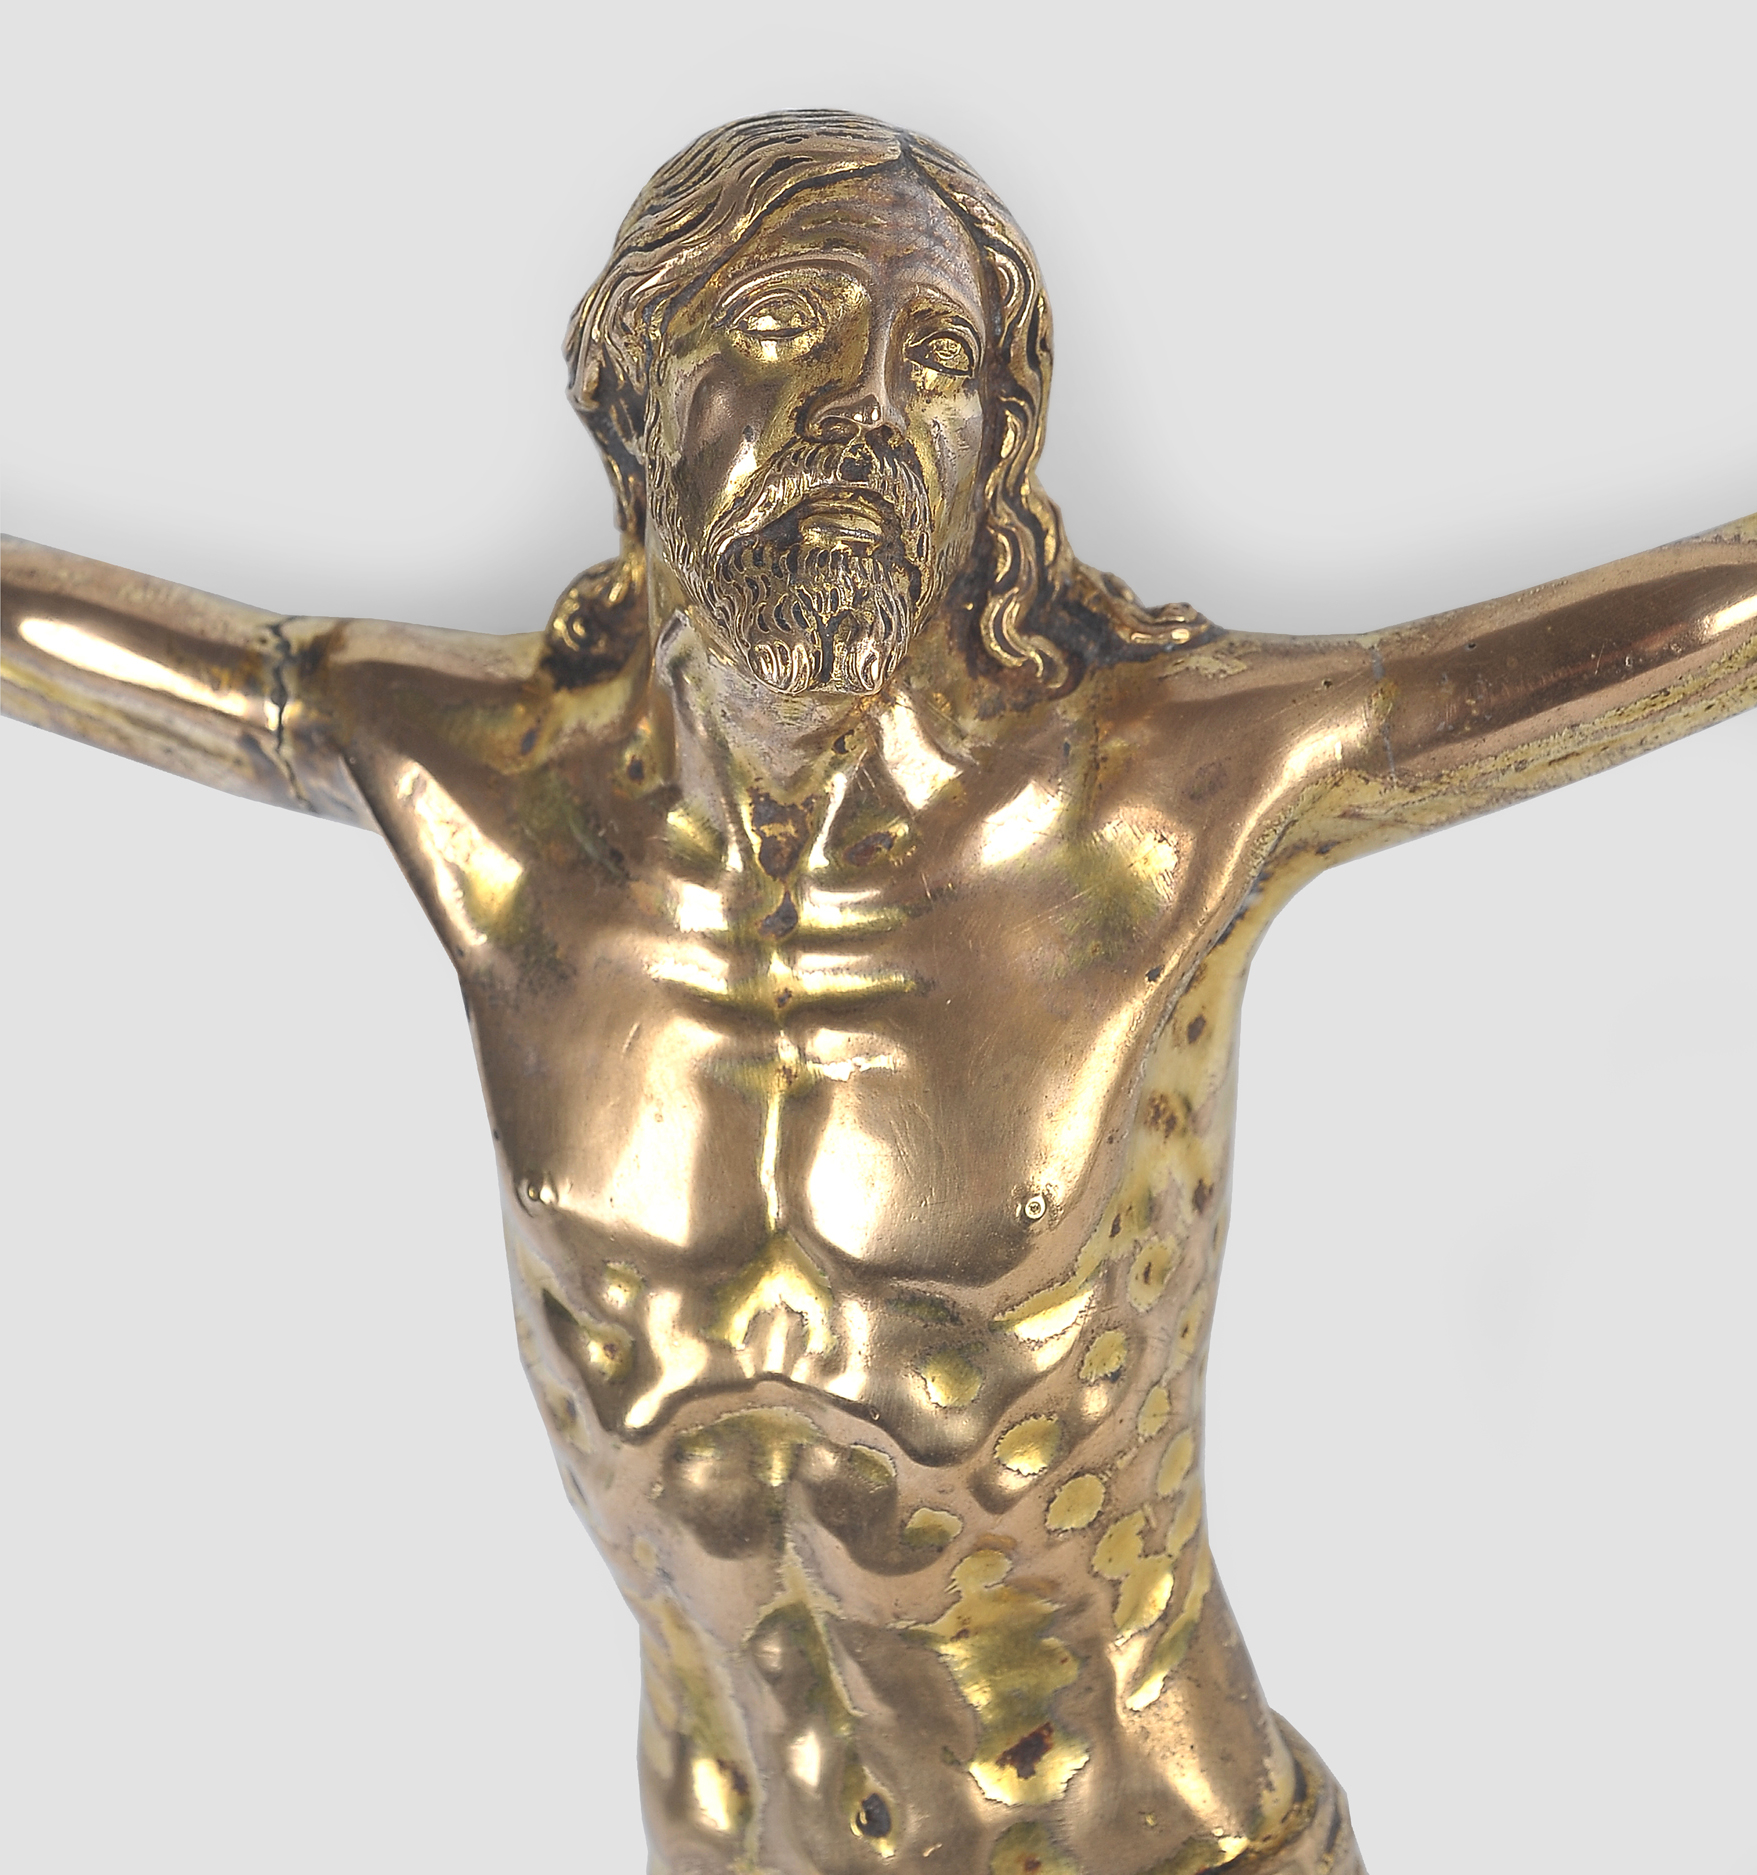 Corpus Christi, Savero da Ravenna 1496-1538 (Umkreis), Bronze - Image 3 of 9